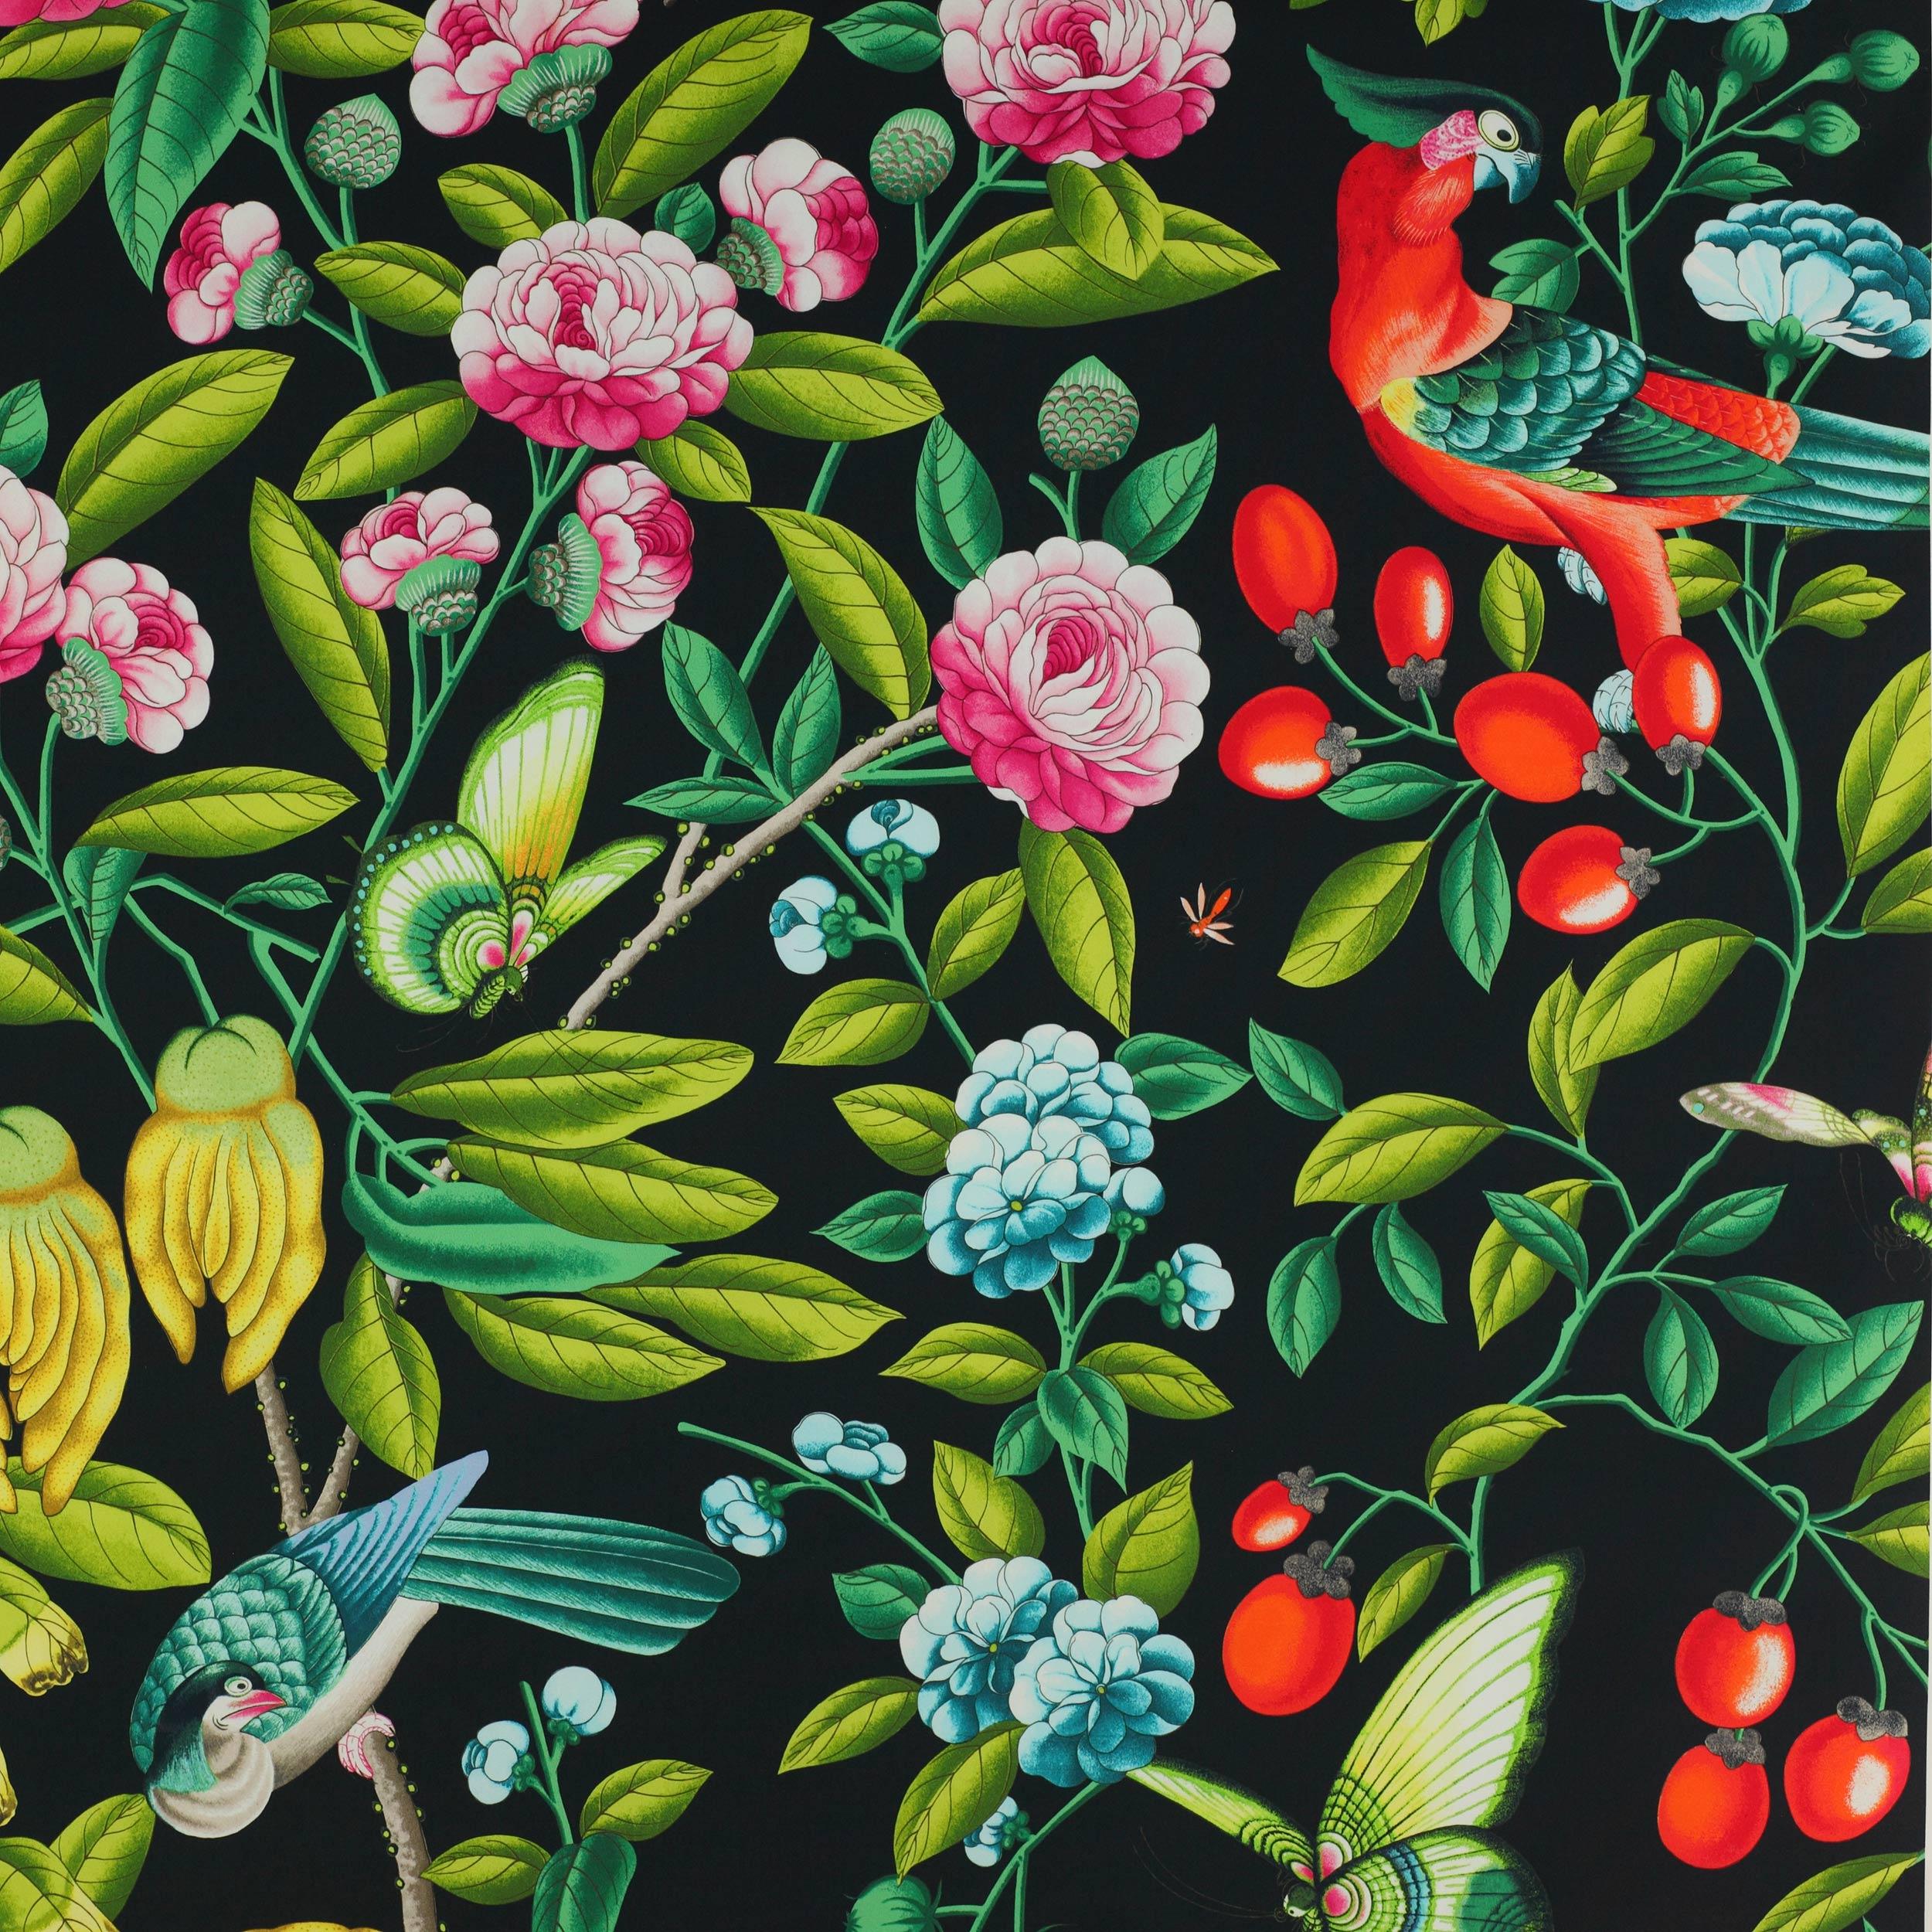 Serendip Fabric   Manuel Canovas 2500x2500